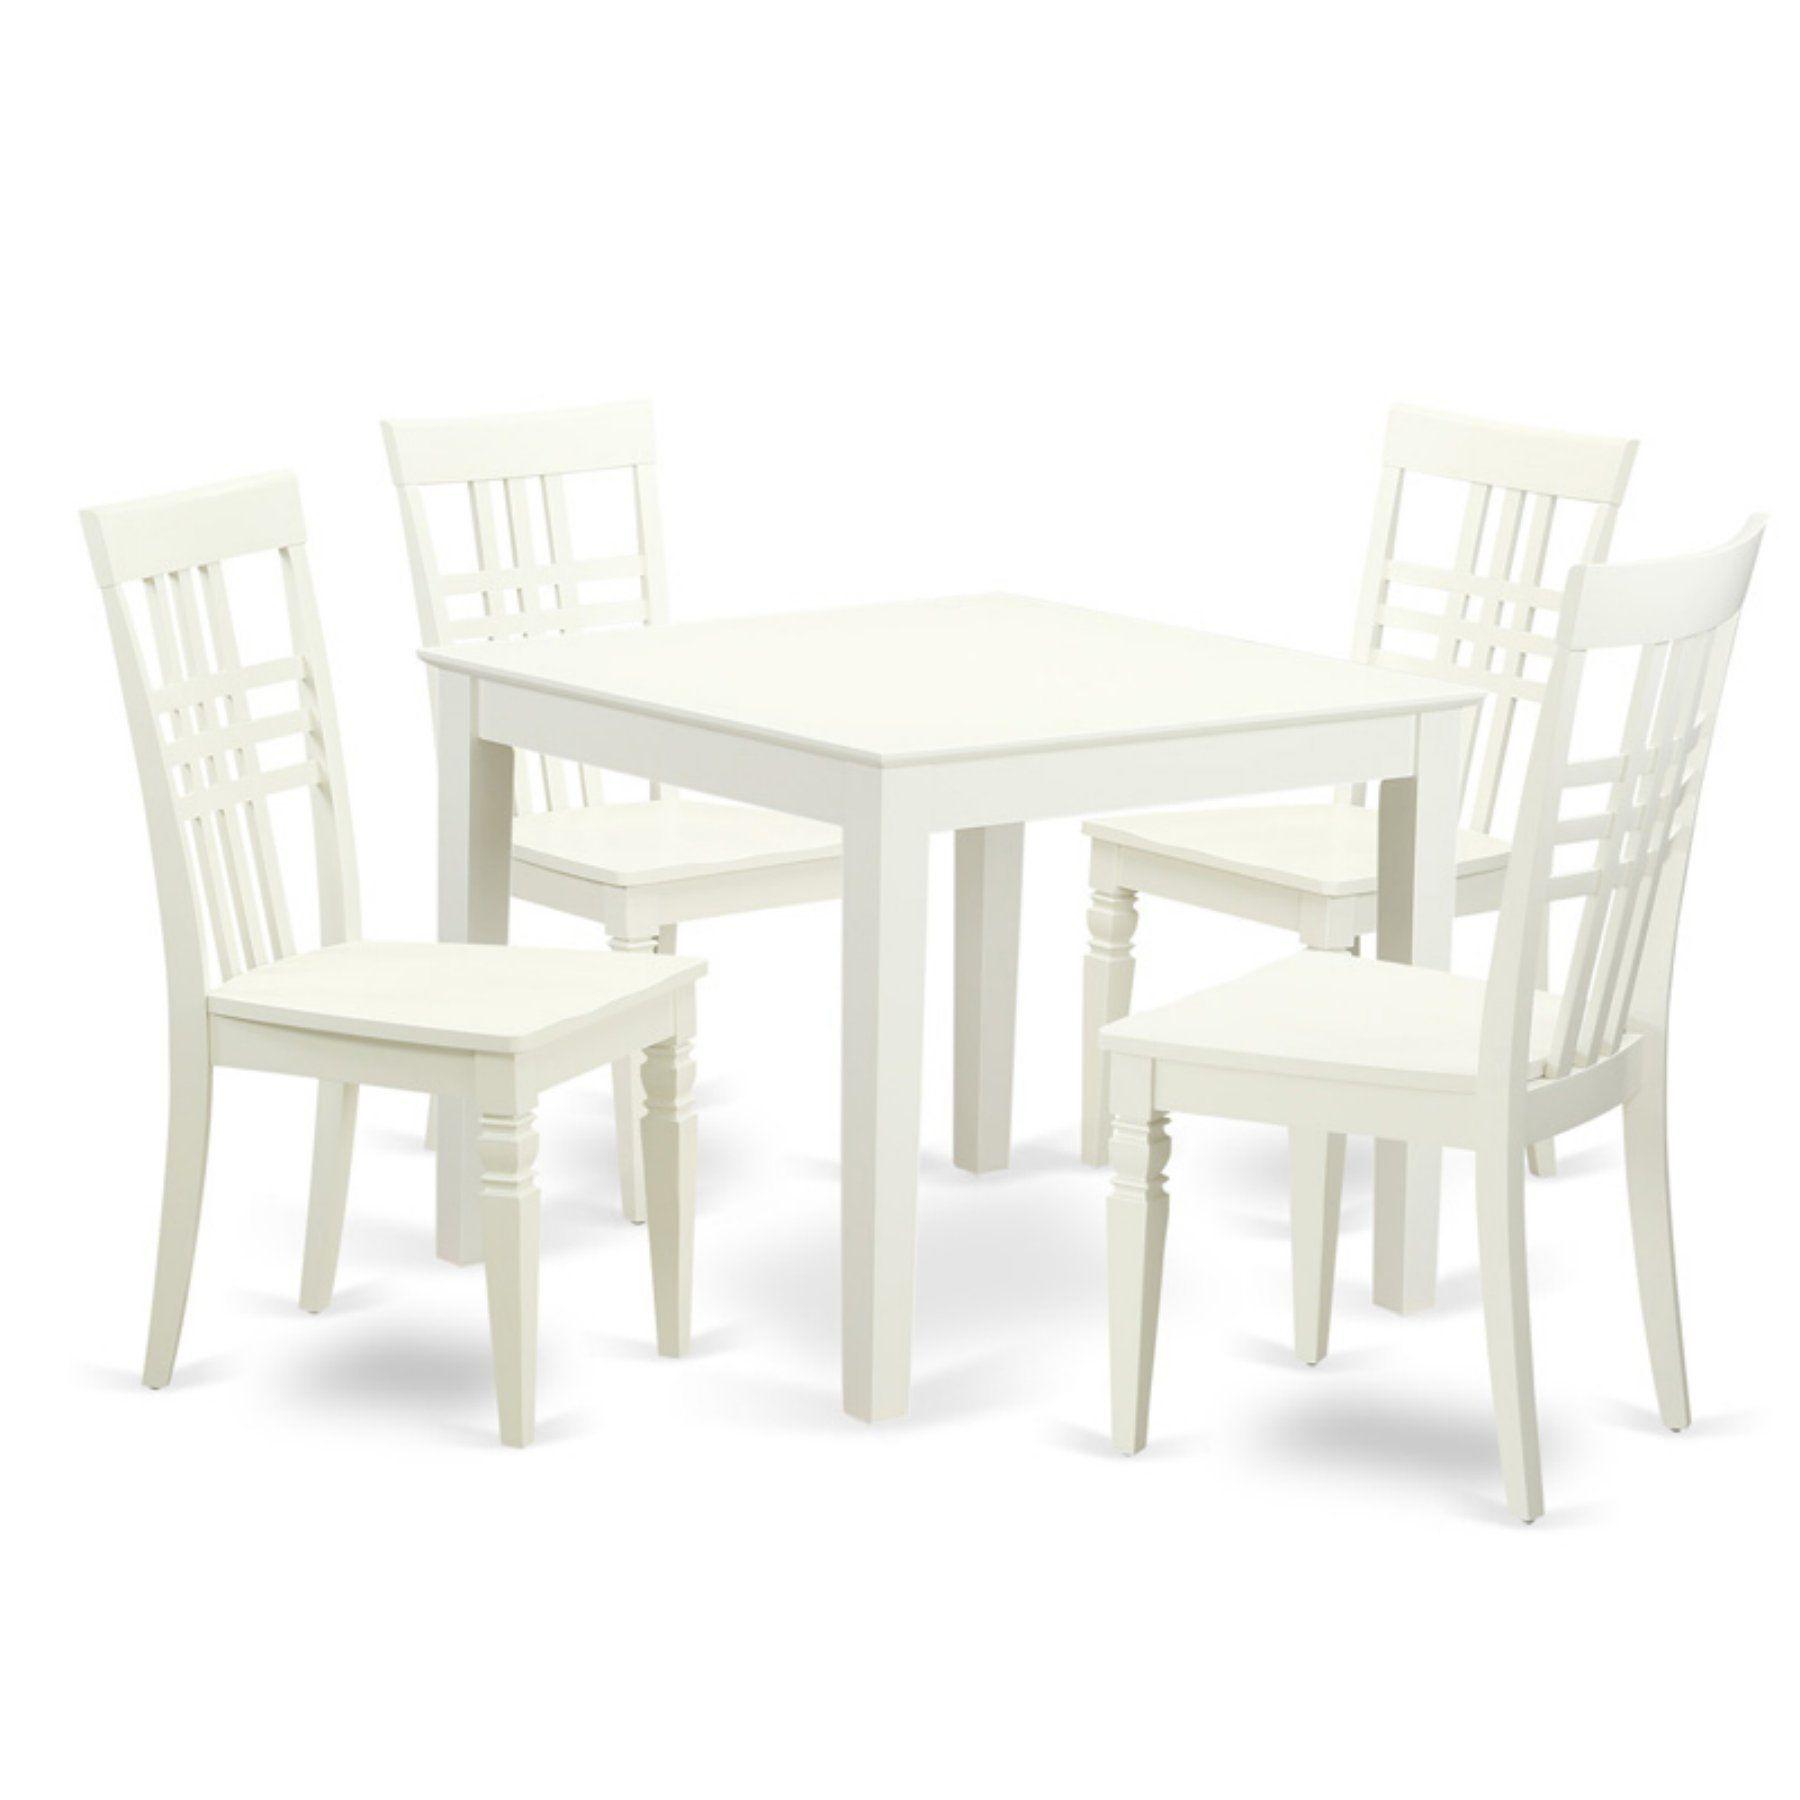 East West Furniture 5 Piece Triple Crossback Breakfast Nook Dining ...